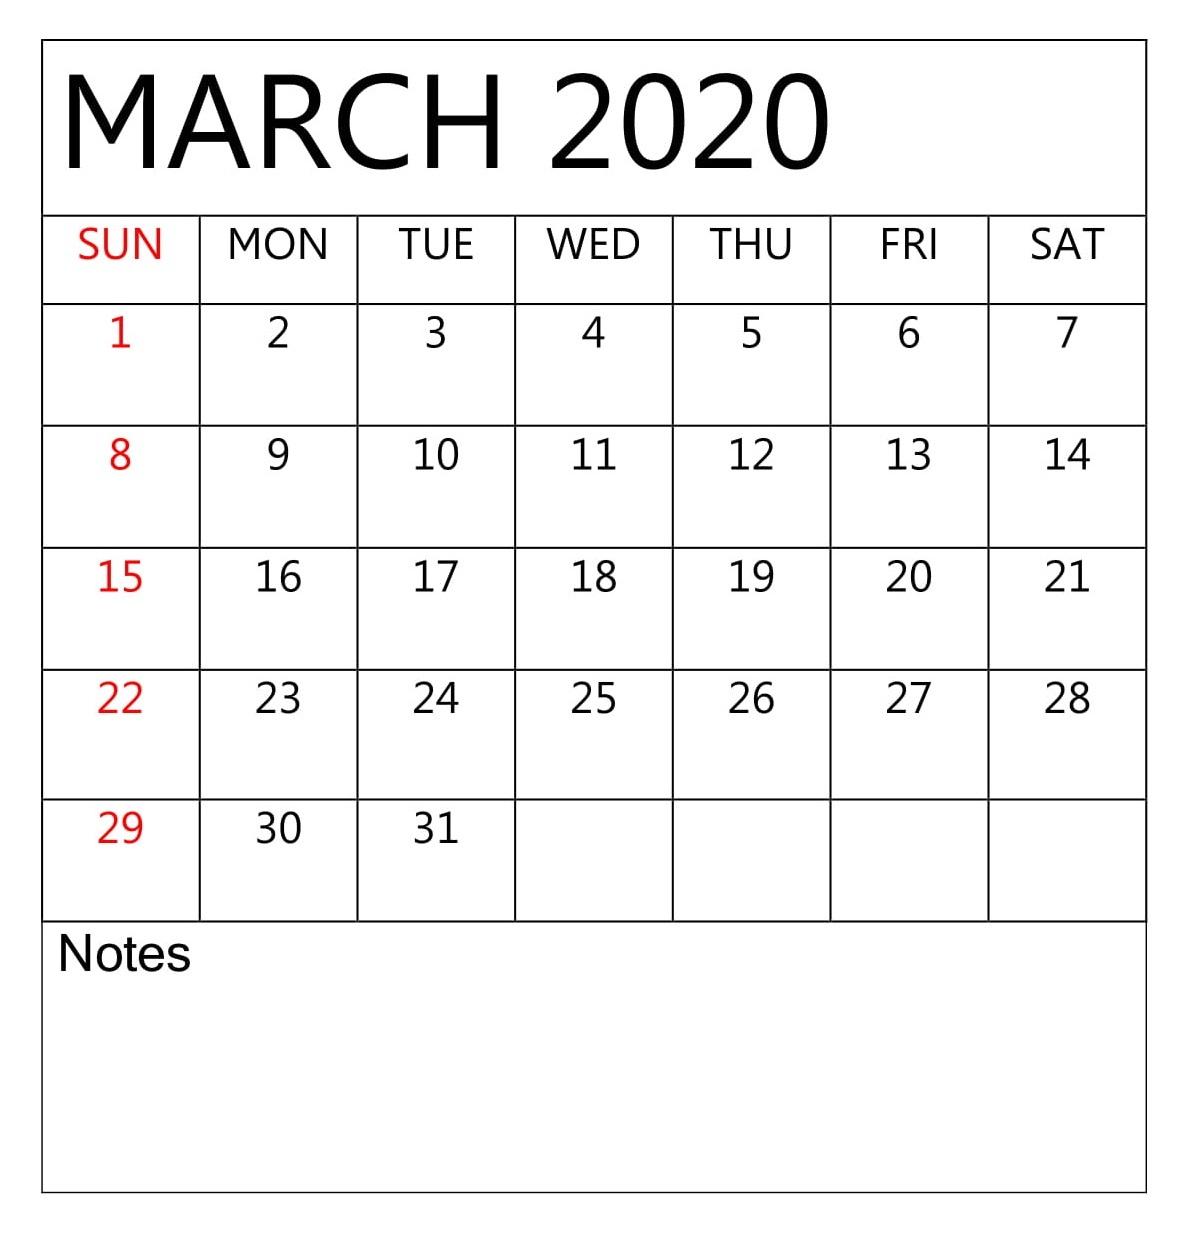 Daily March 2020 Calendar Planner